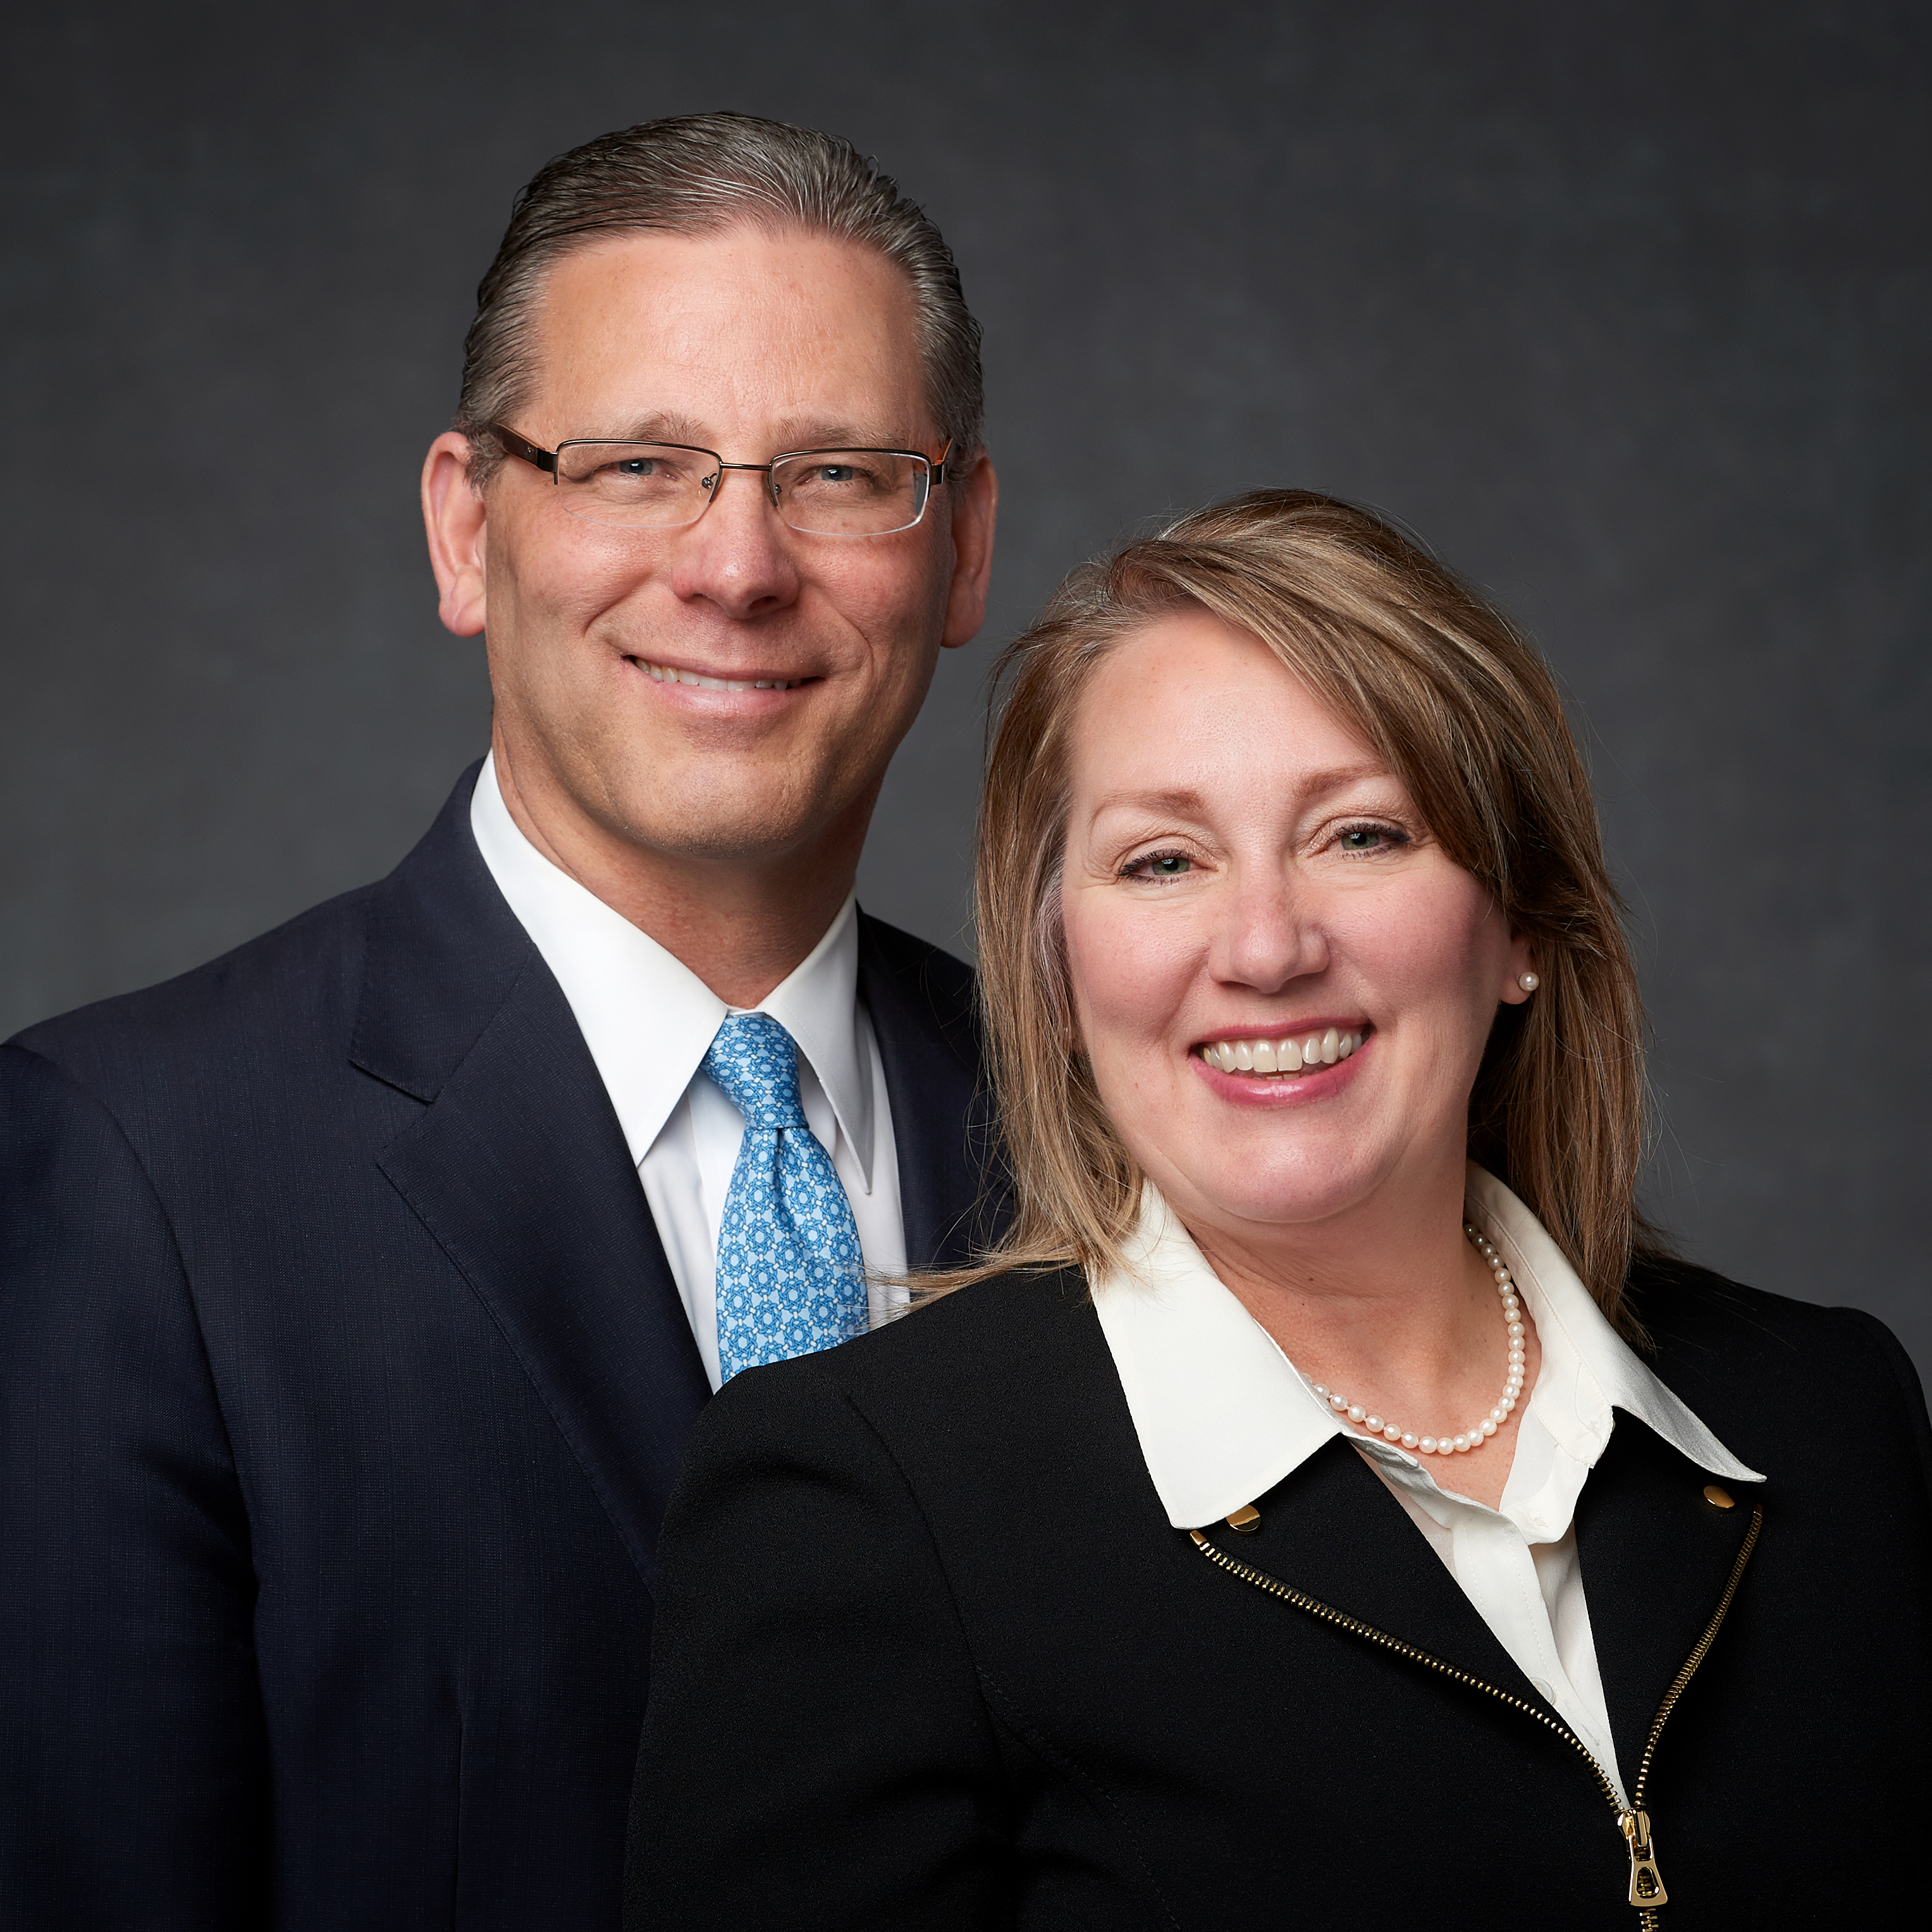 Ronald M. and Teresa Judd